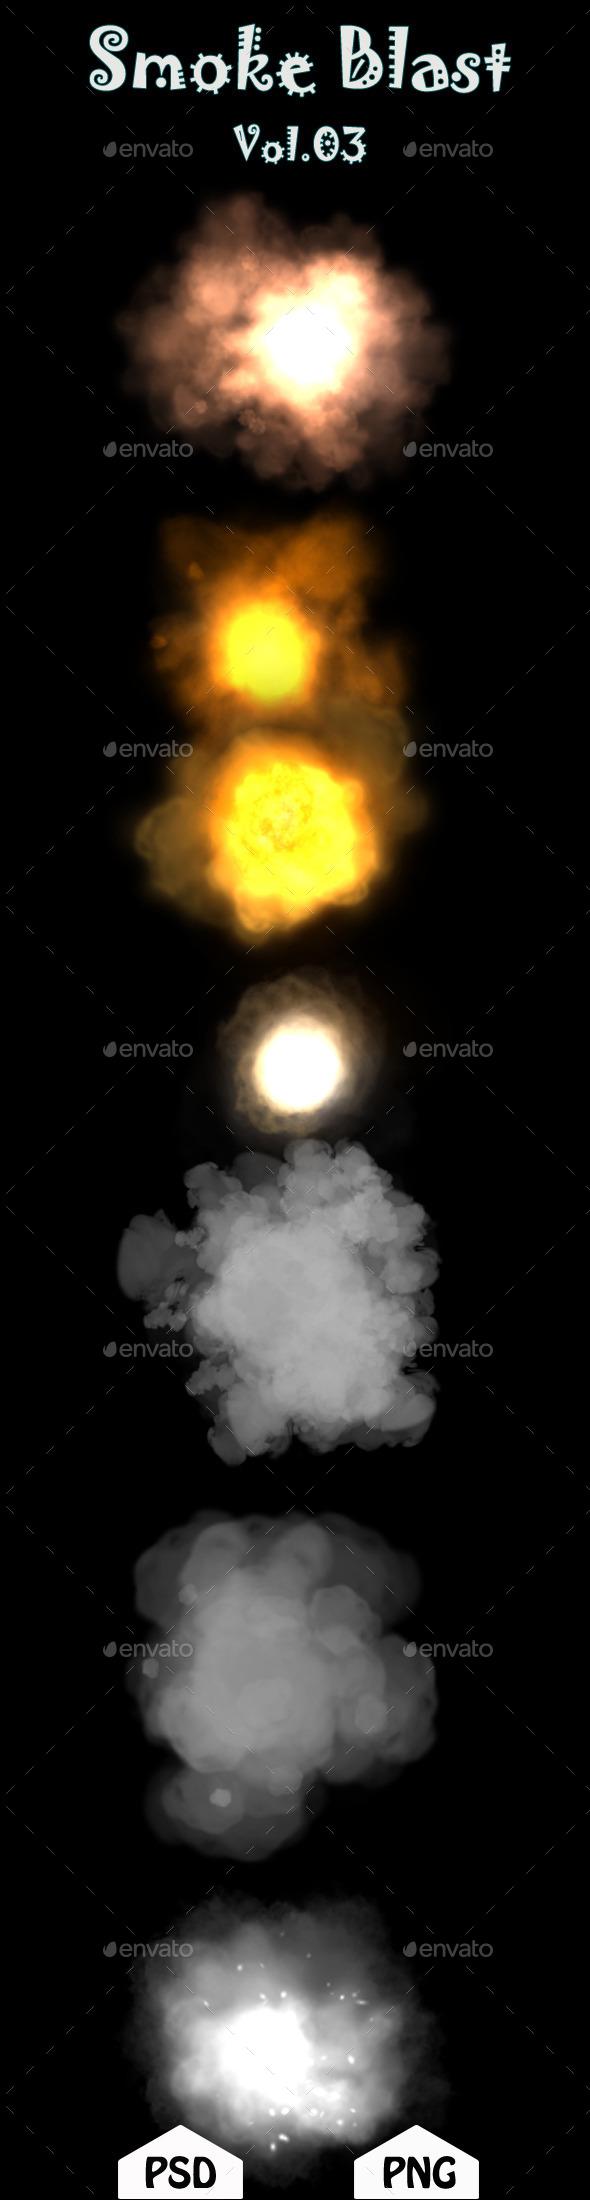 Smoke Blast Vol.03 - Sprites Game Assets